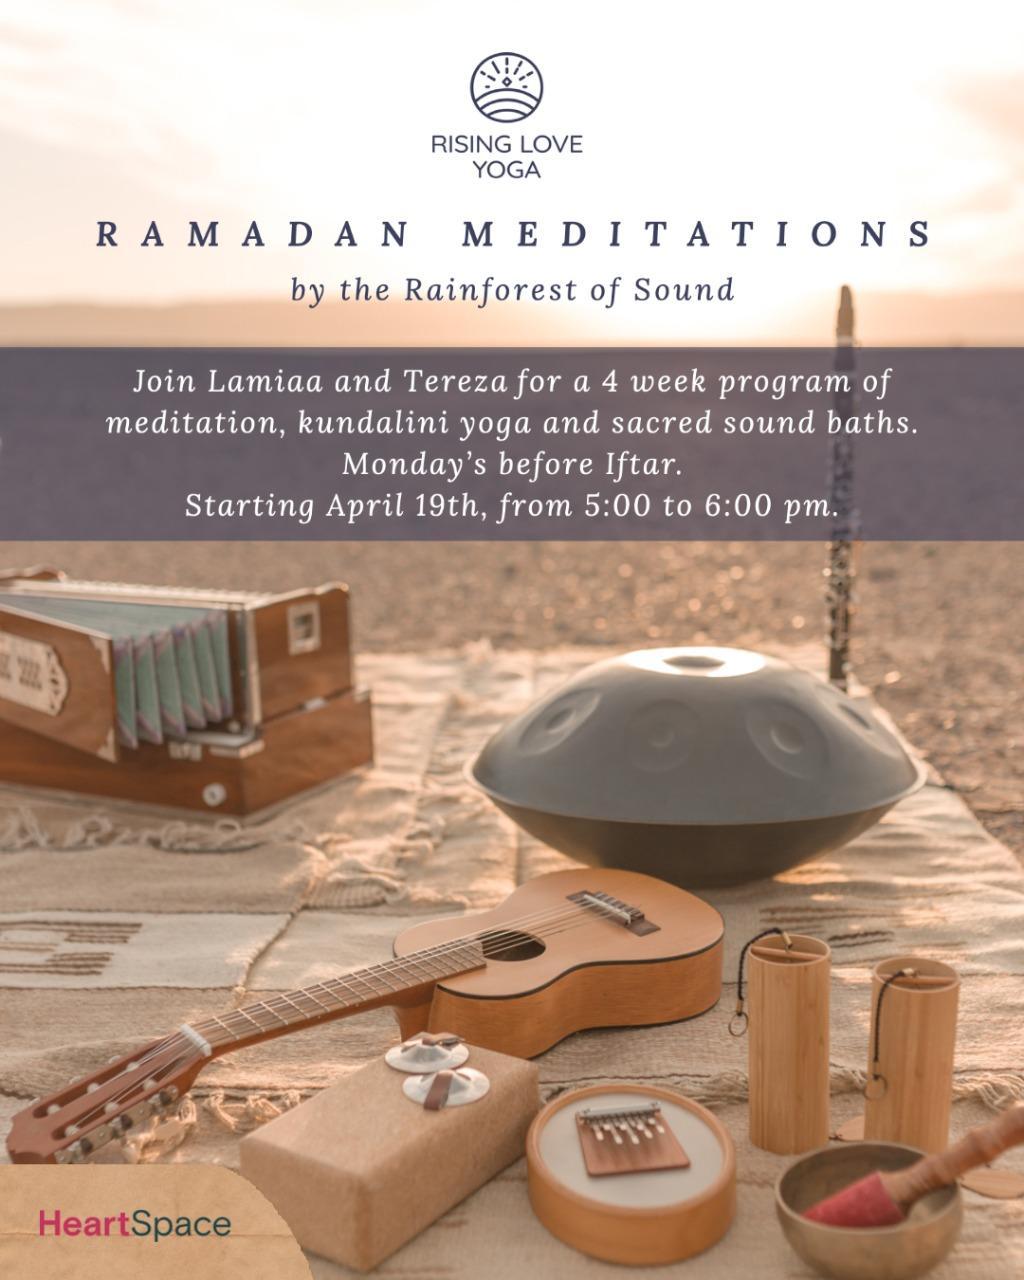 Ramadan Meditations by Rainforest of sound